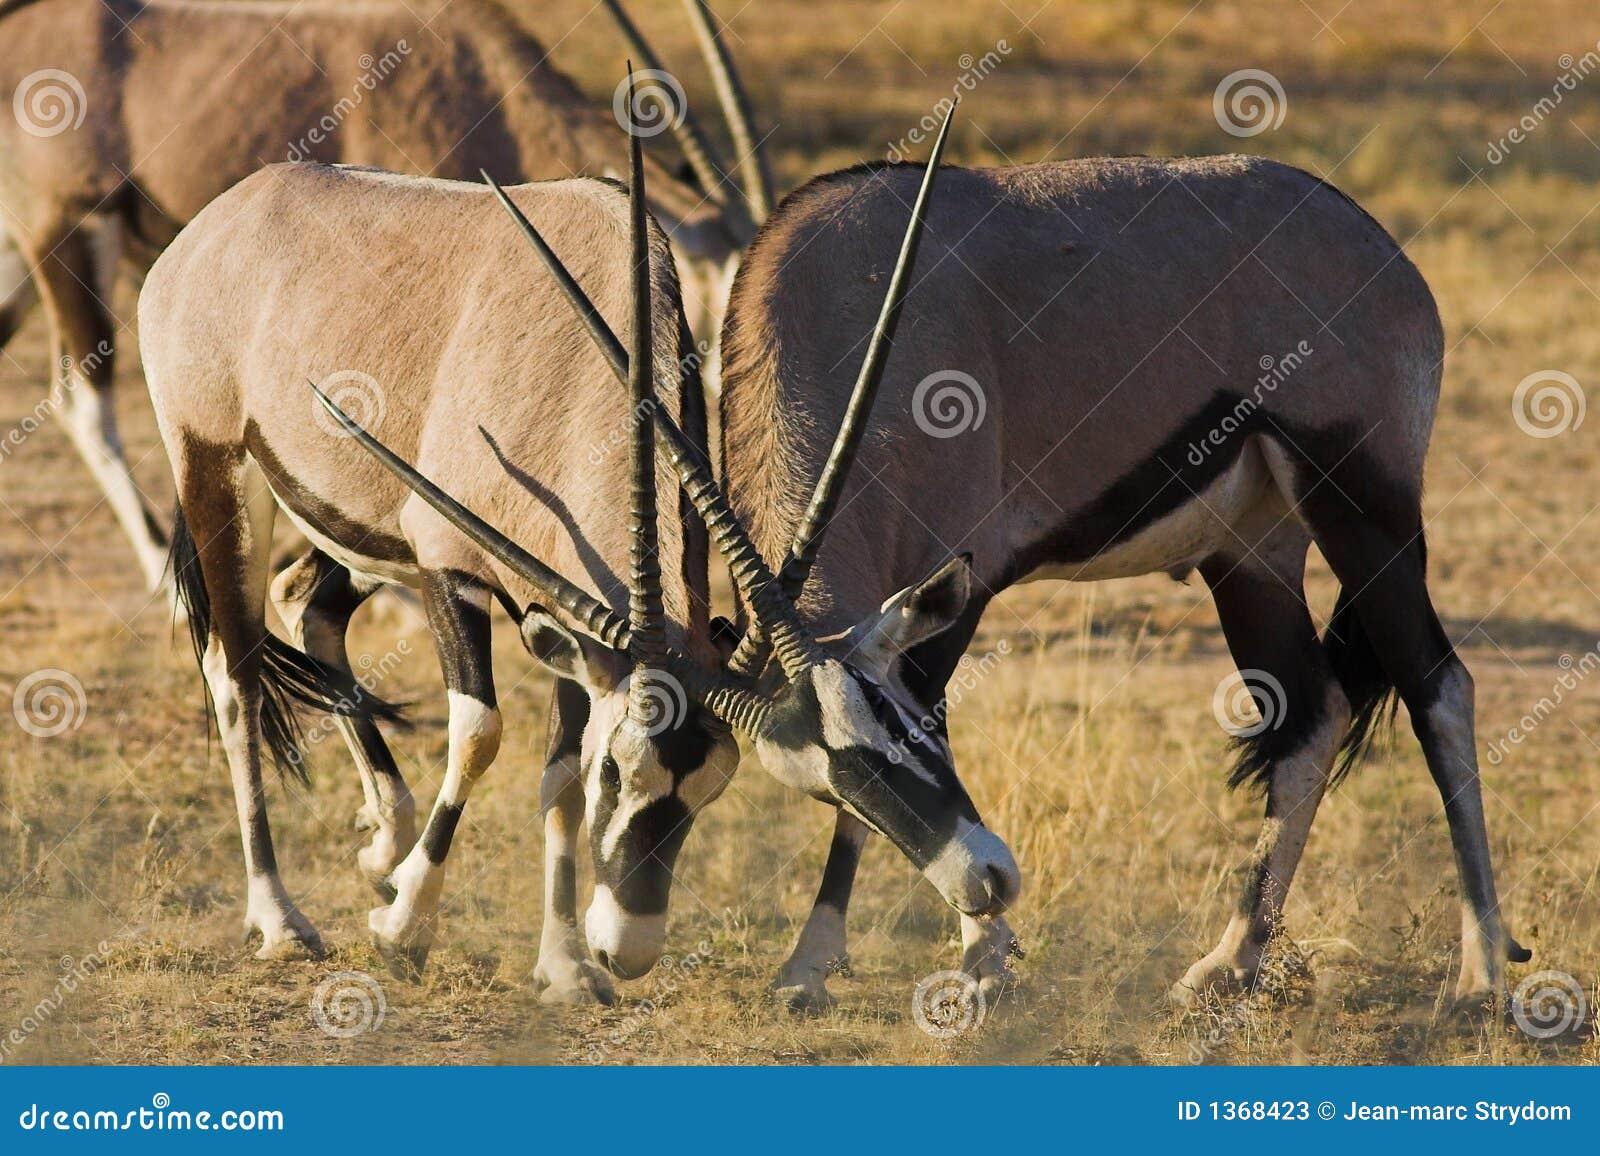 Gemsbok Fighting Stock Photos - Image: 1368423